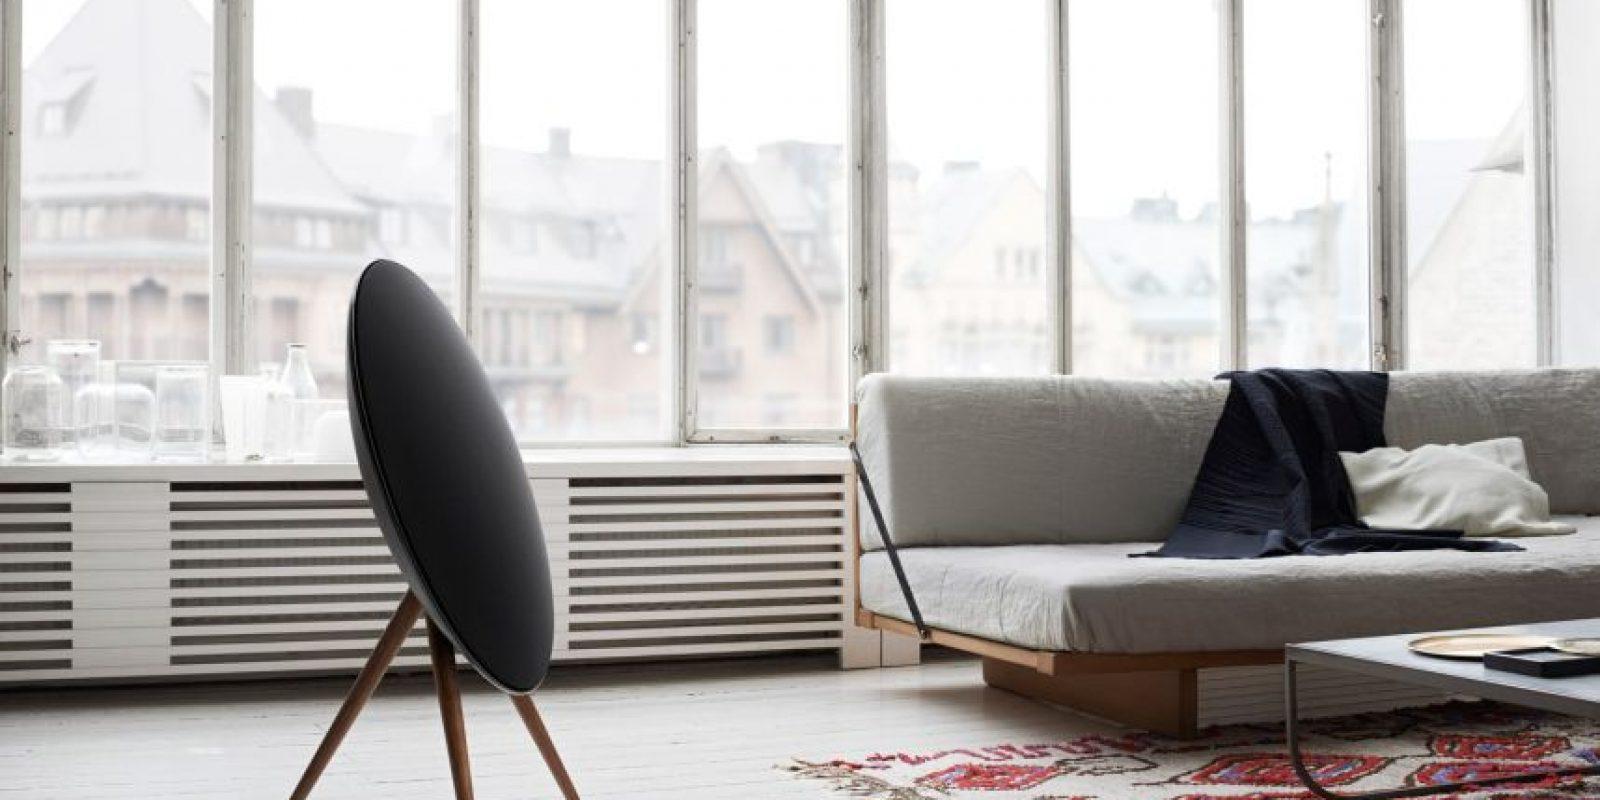 Foto:Bang & Olufsen. Imagen Por: